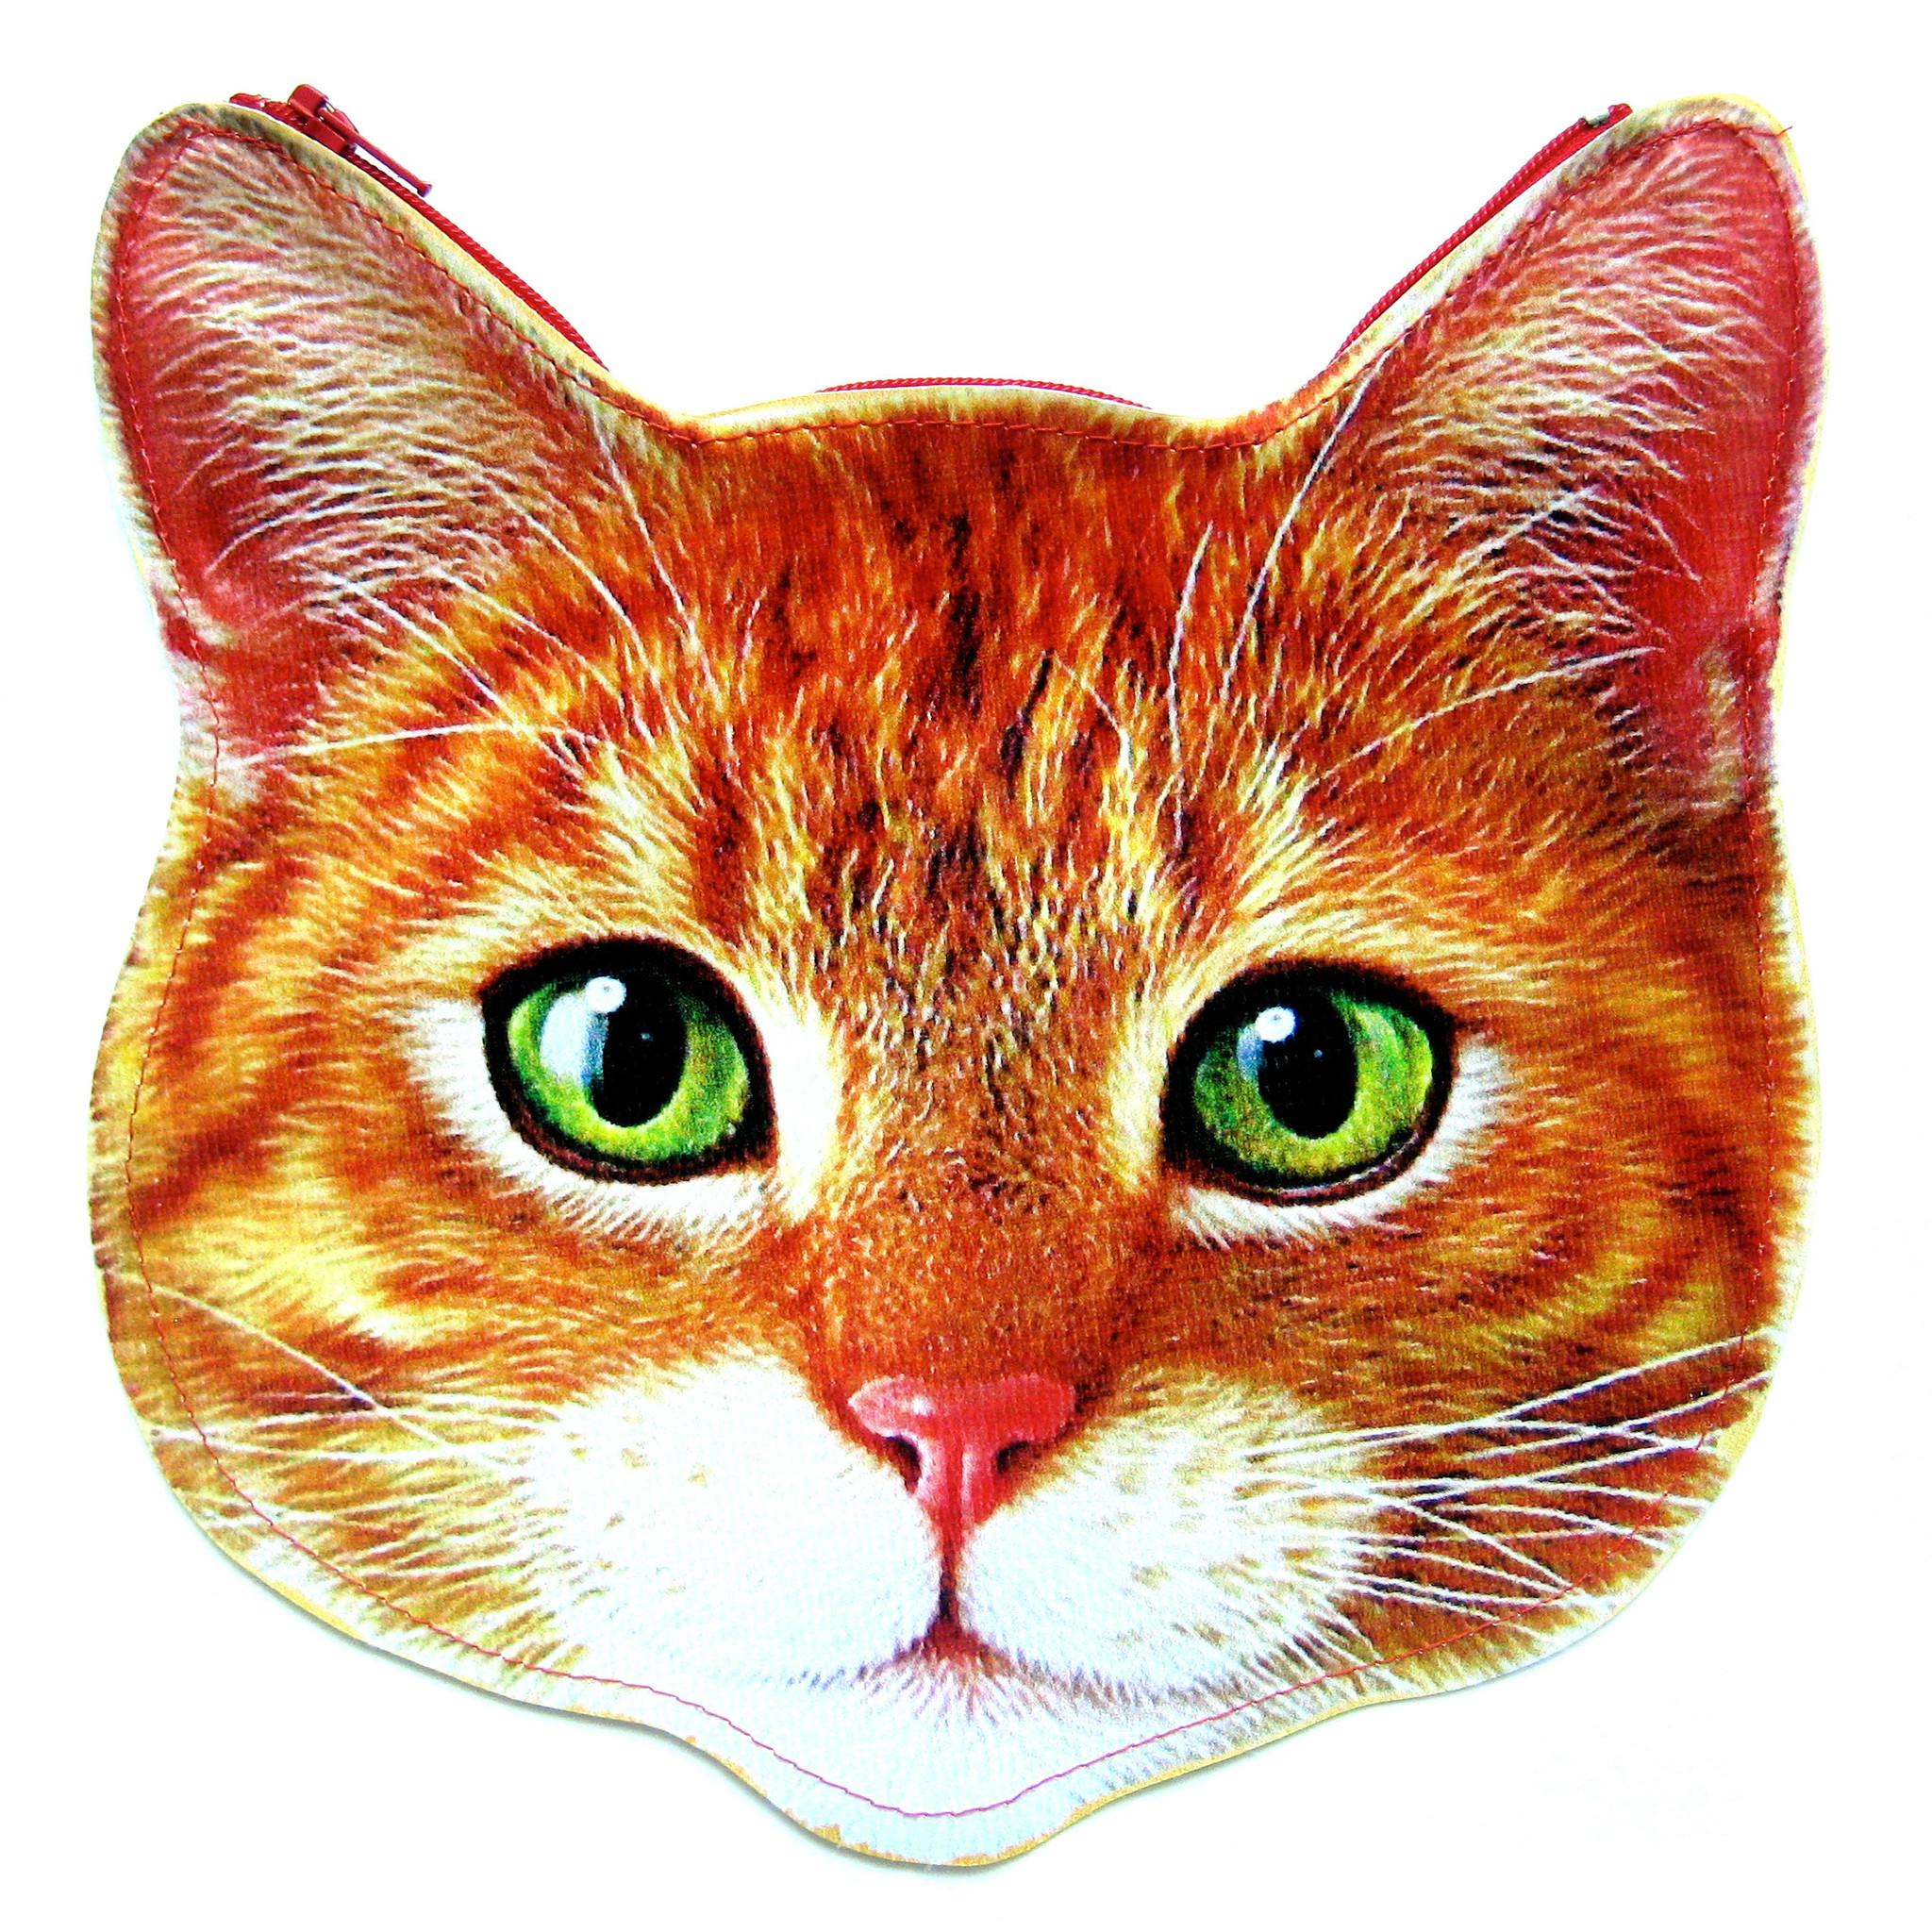 Kitty Cat Head Shaped Tabby Vinyl Animal Themed Clutch Bag